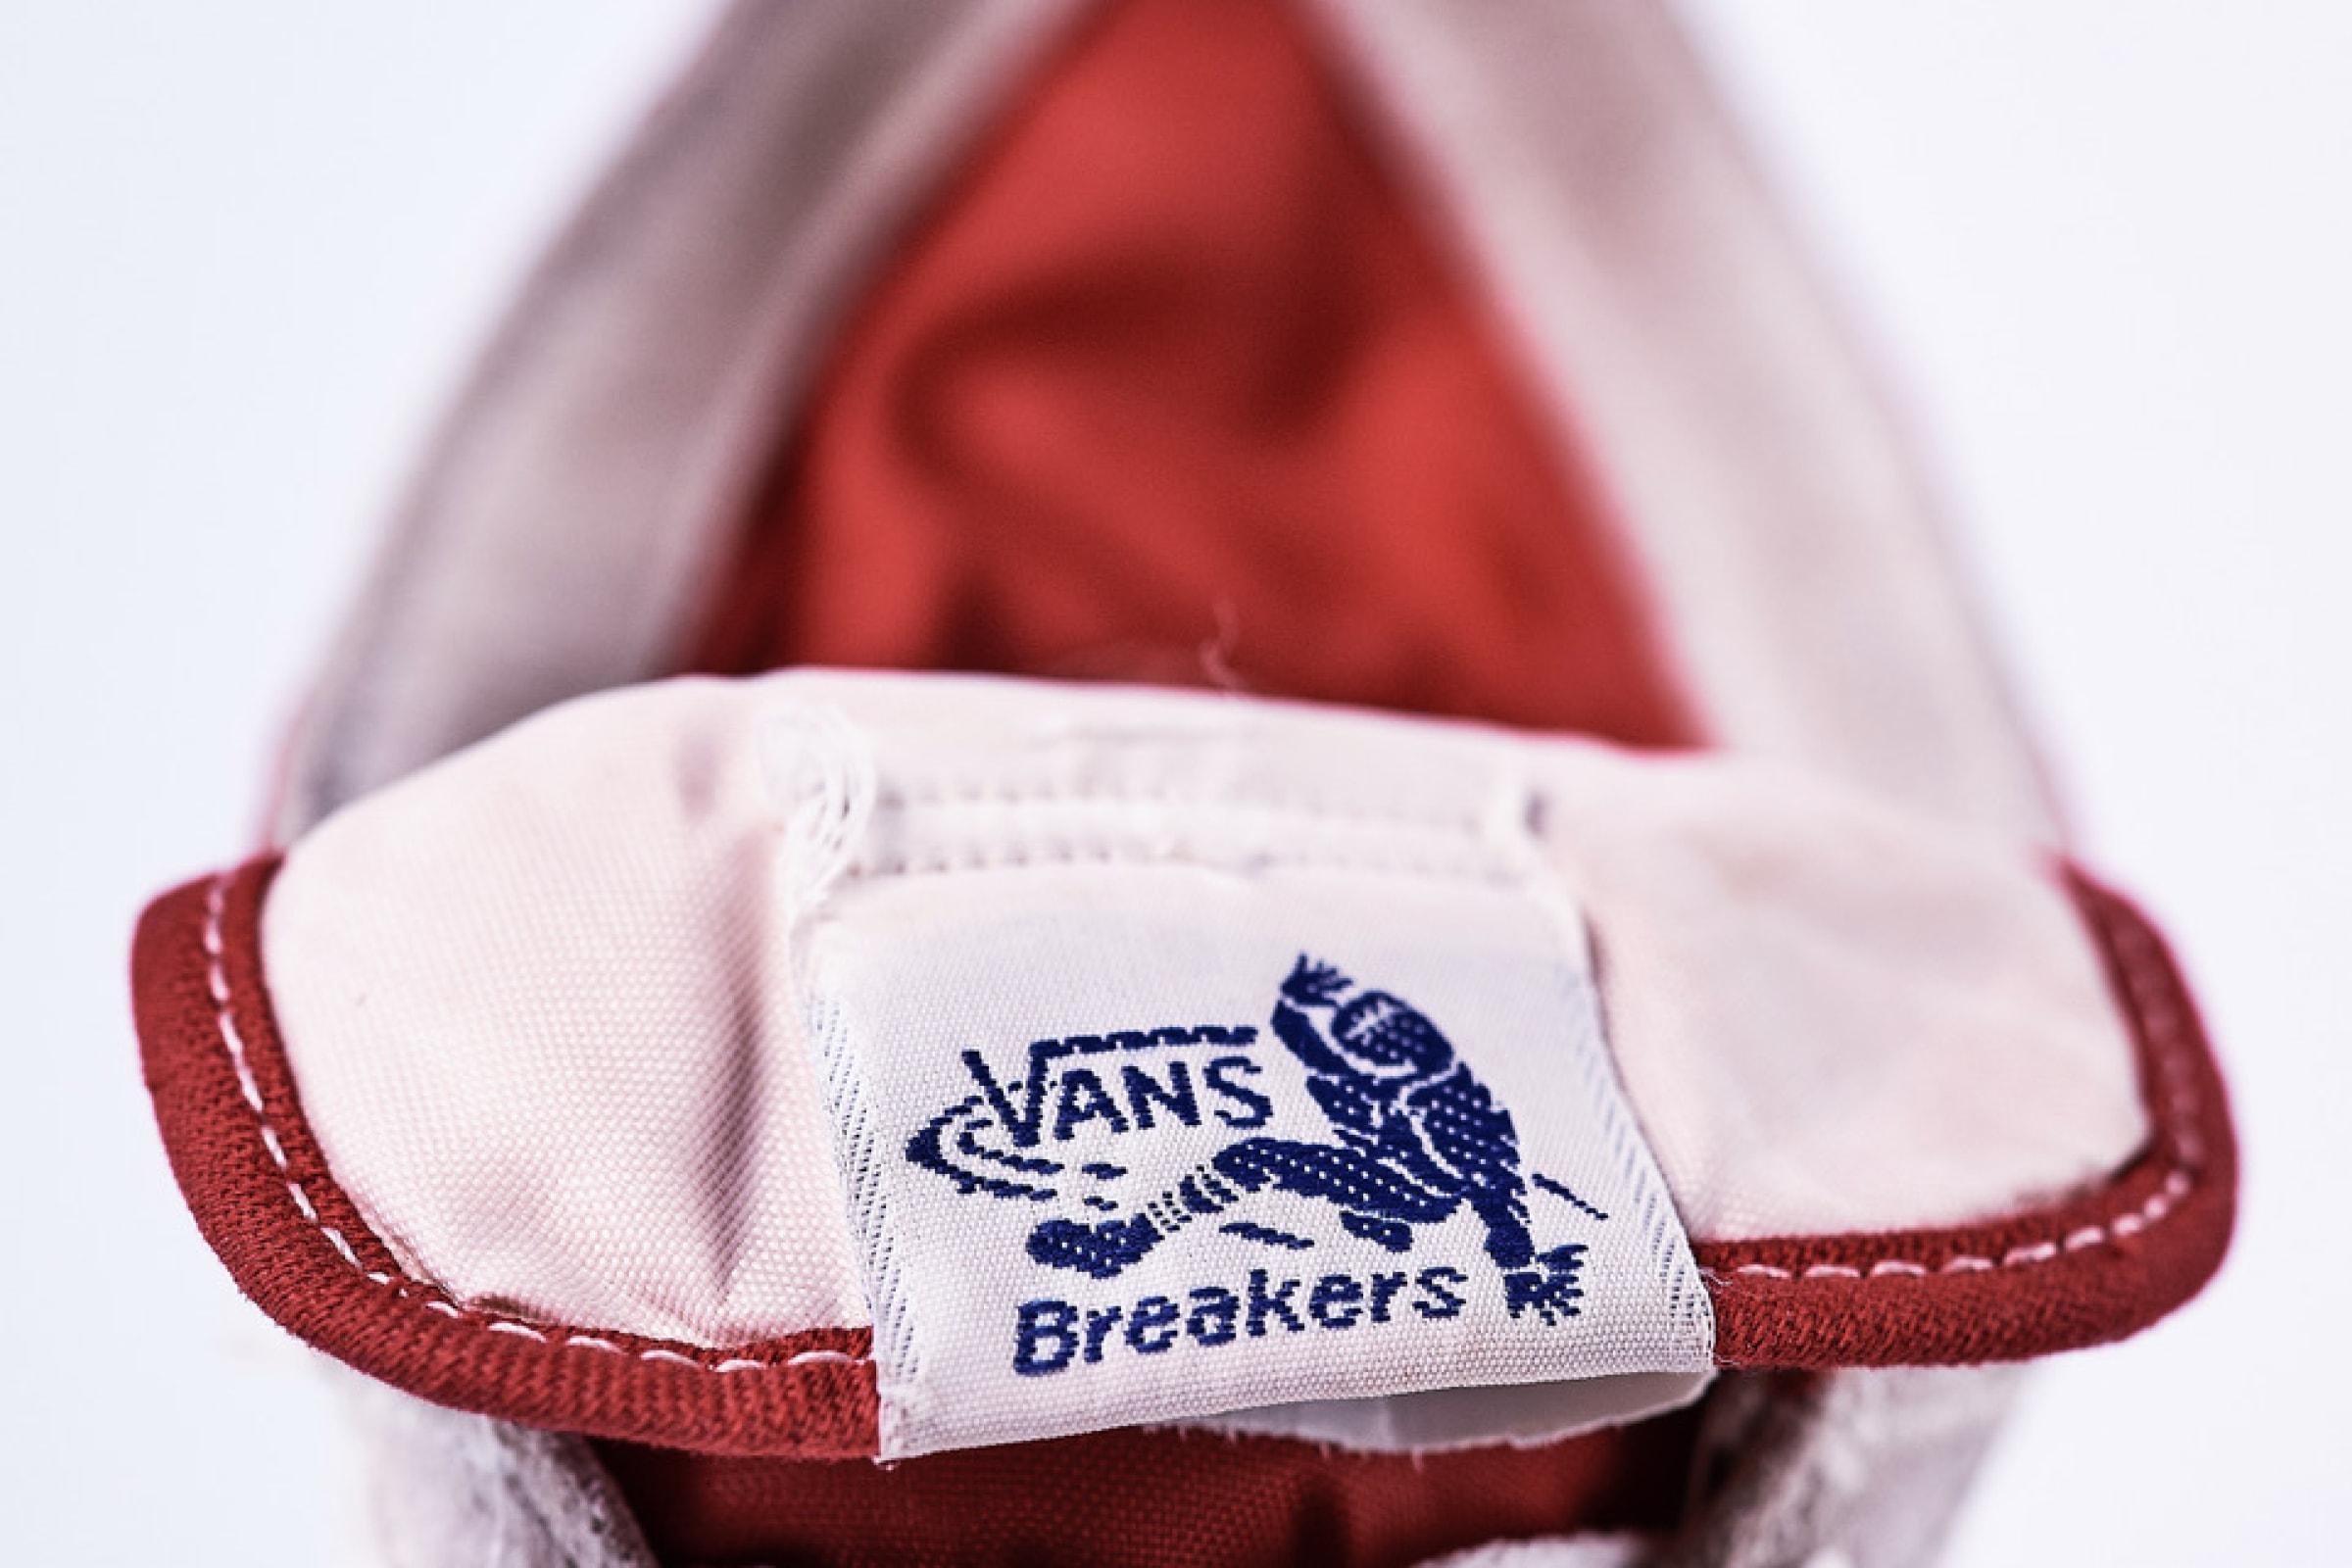 Vans Breakers